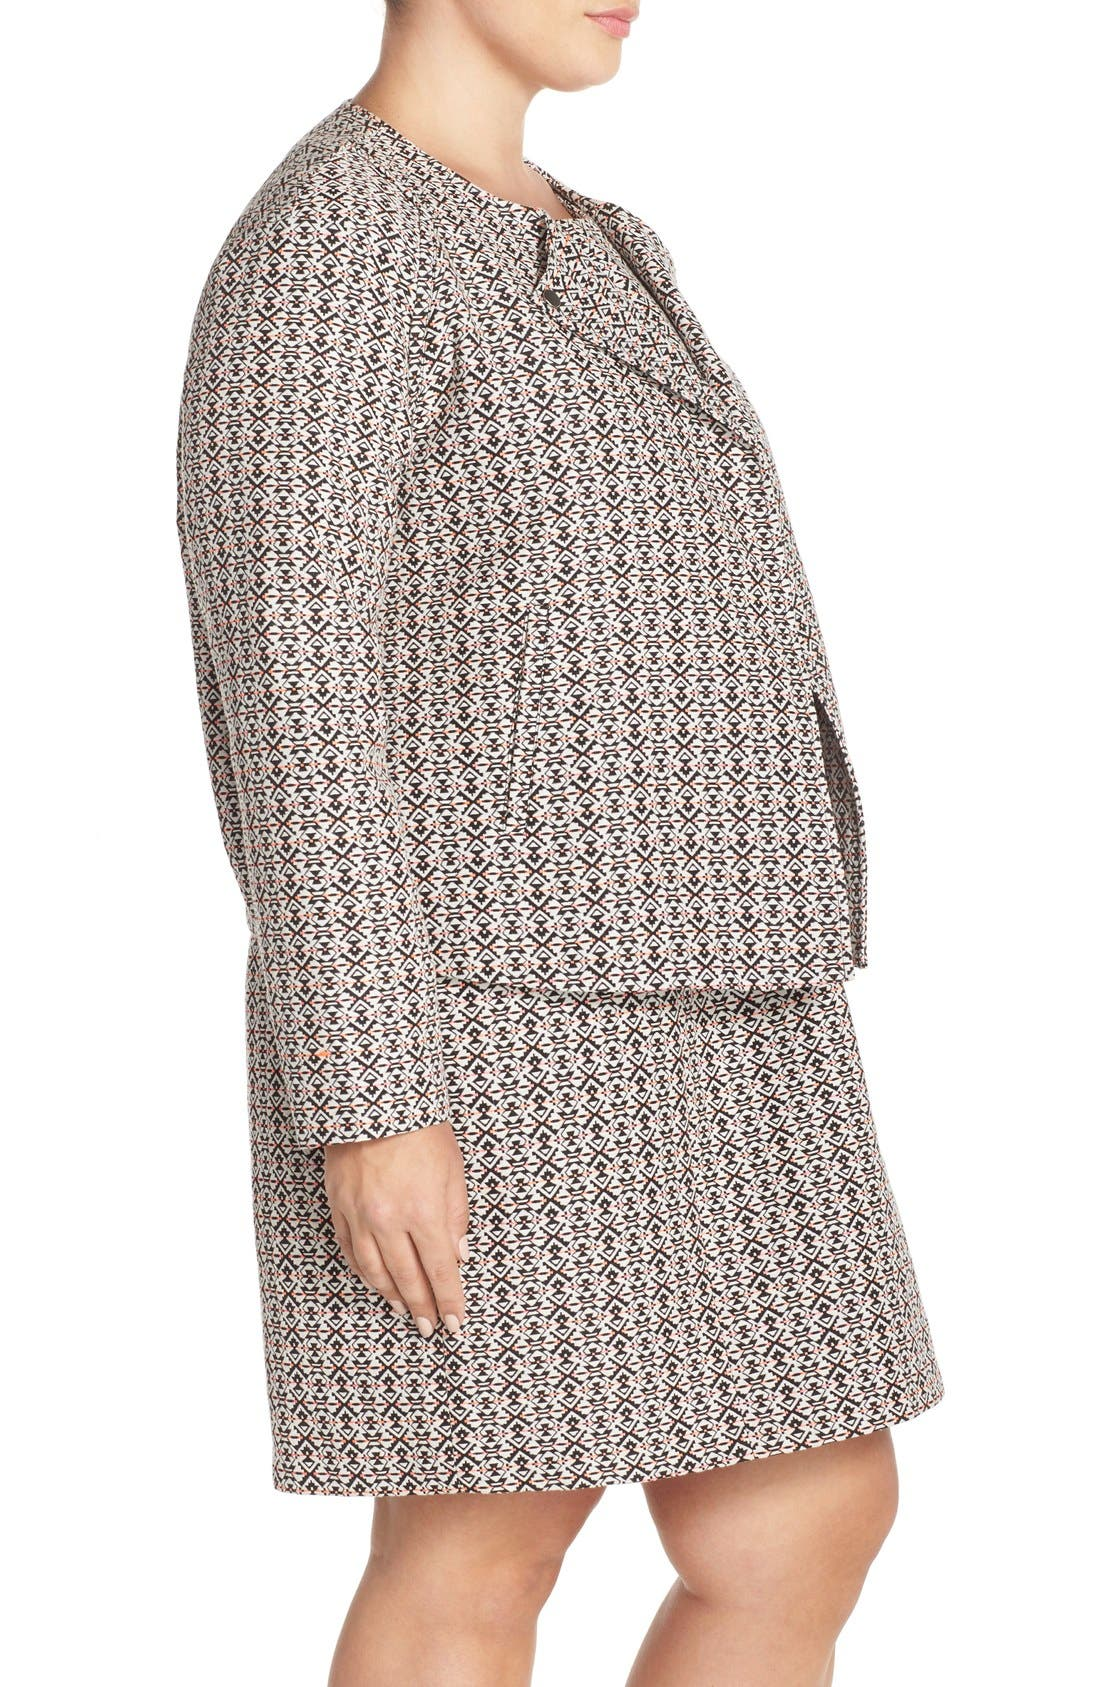 Alternate Image 2  - Tart 'Aviana' Print Collarless Jacket (Plus Size)